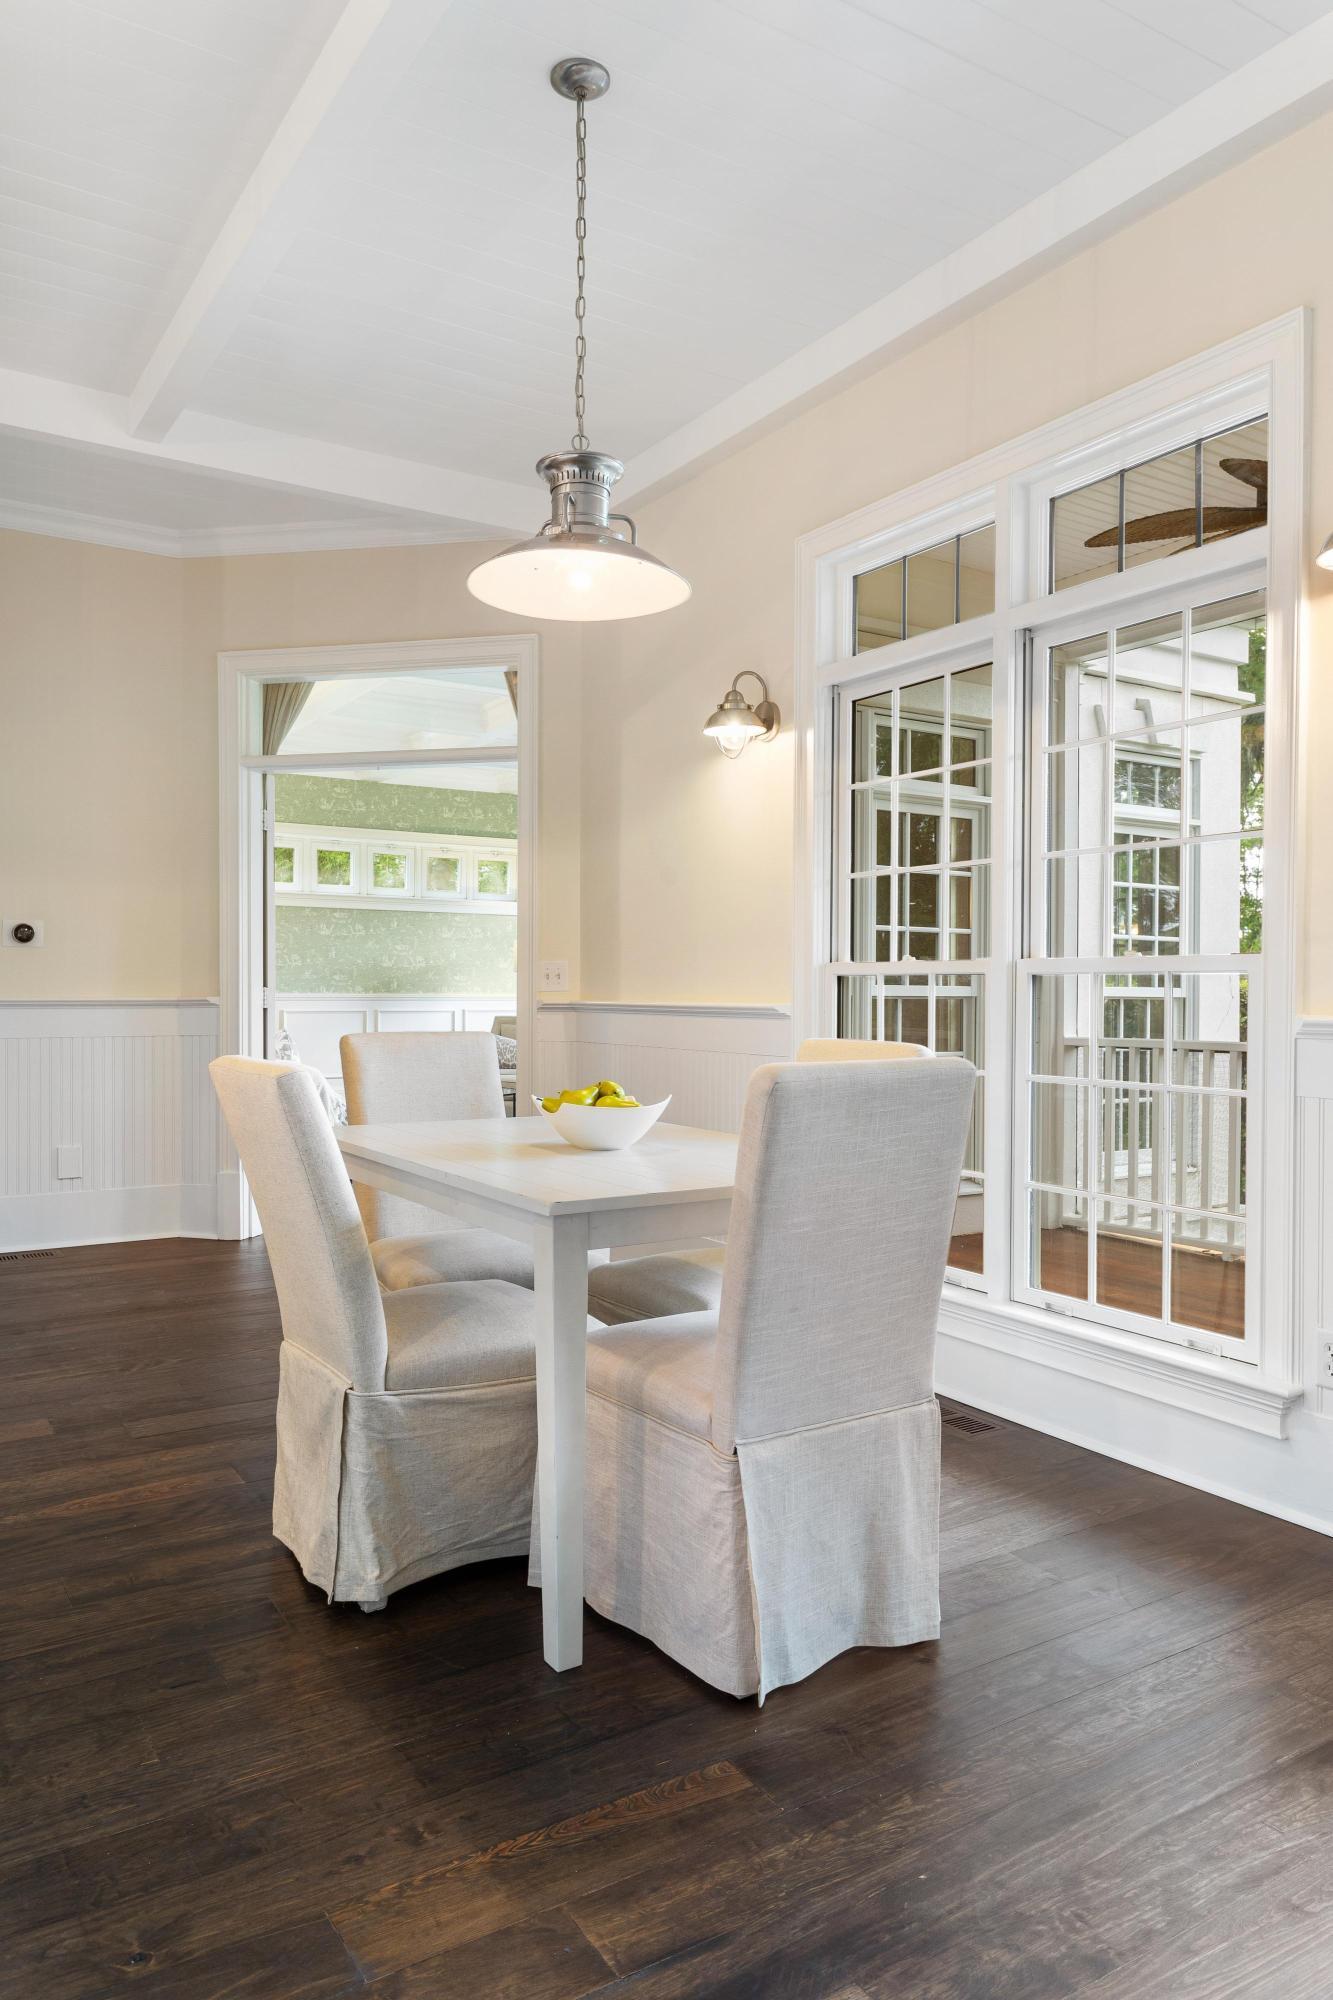 Dunes West Homes For Sale - 3050 Pignatelli Crescent, Mount Pleasant, SC - 45